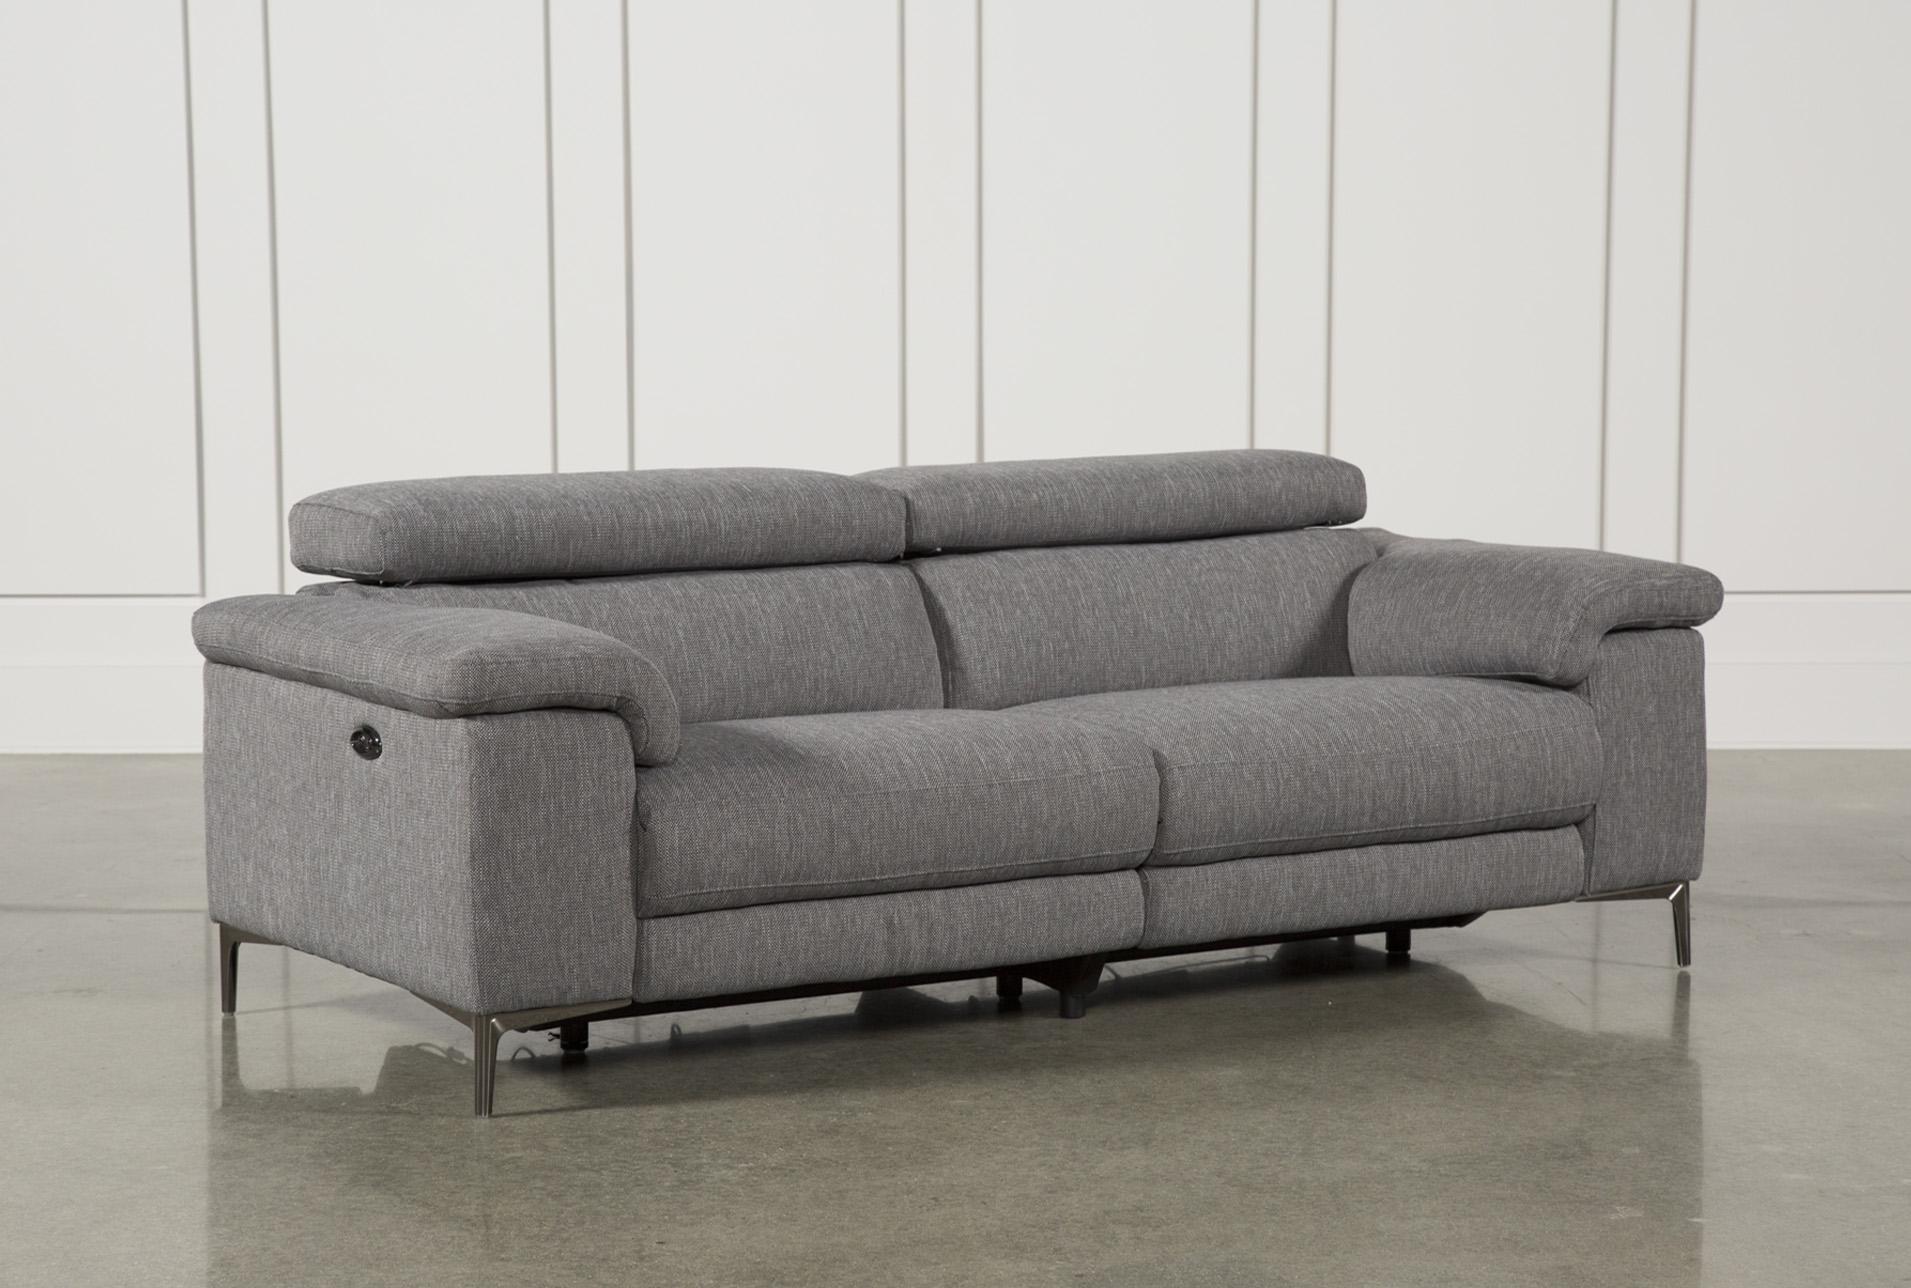 Talin Reclining Grey Wusb Power Sofa qUpMVSz